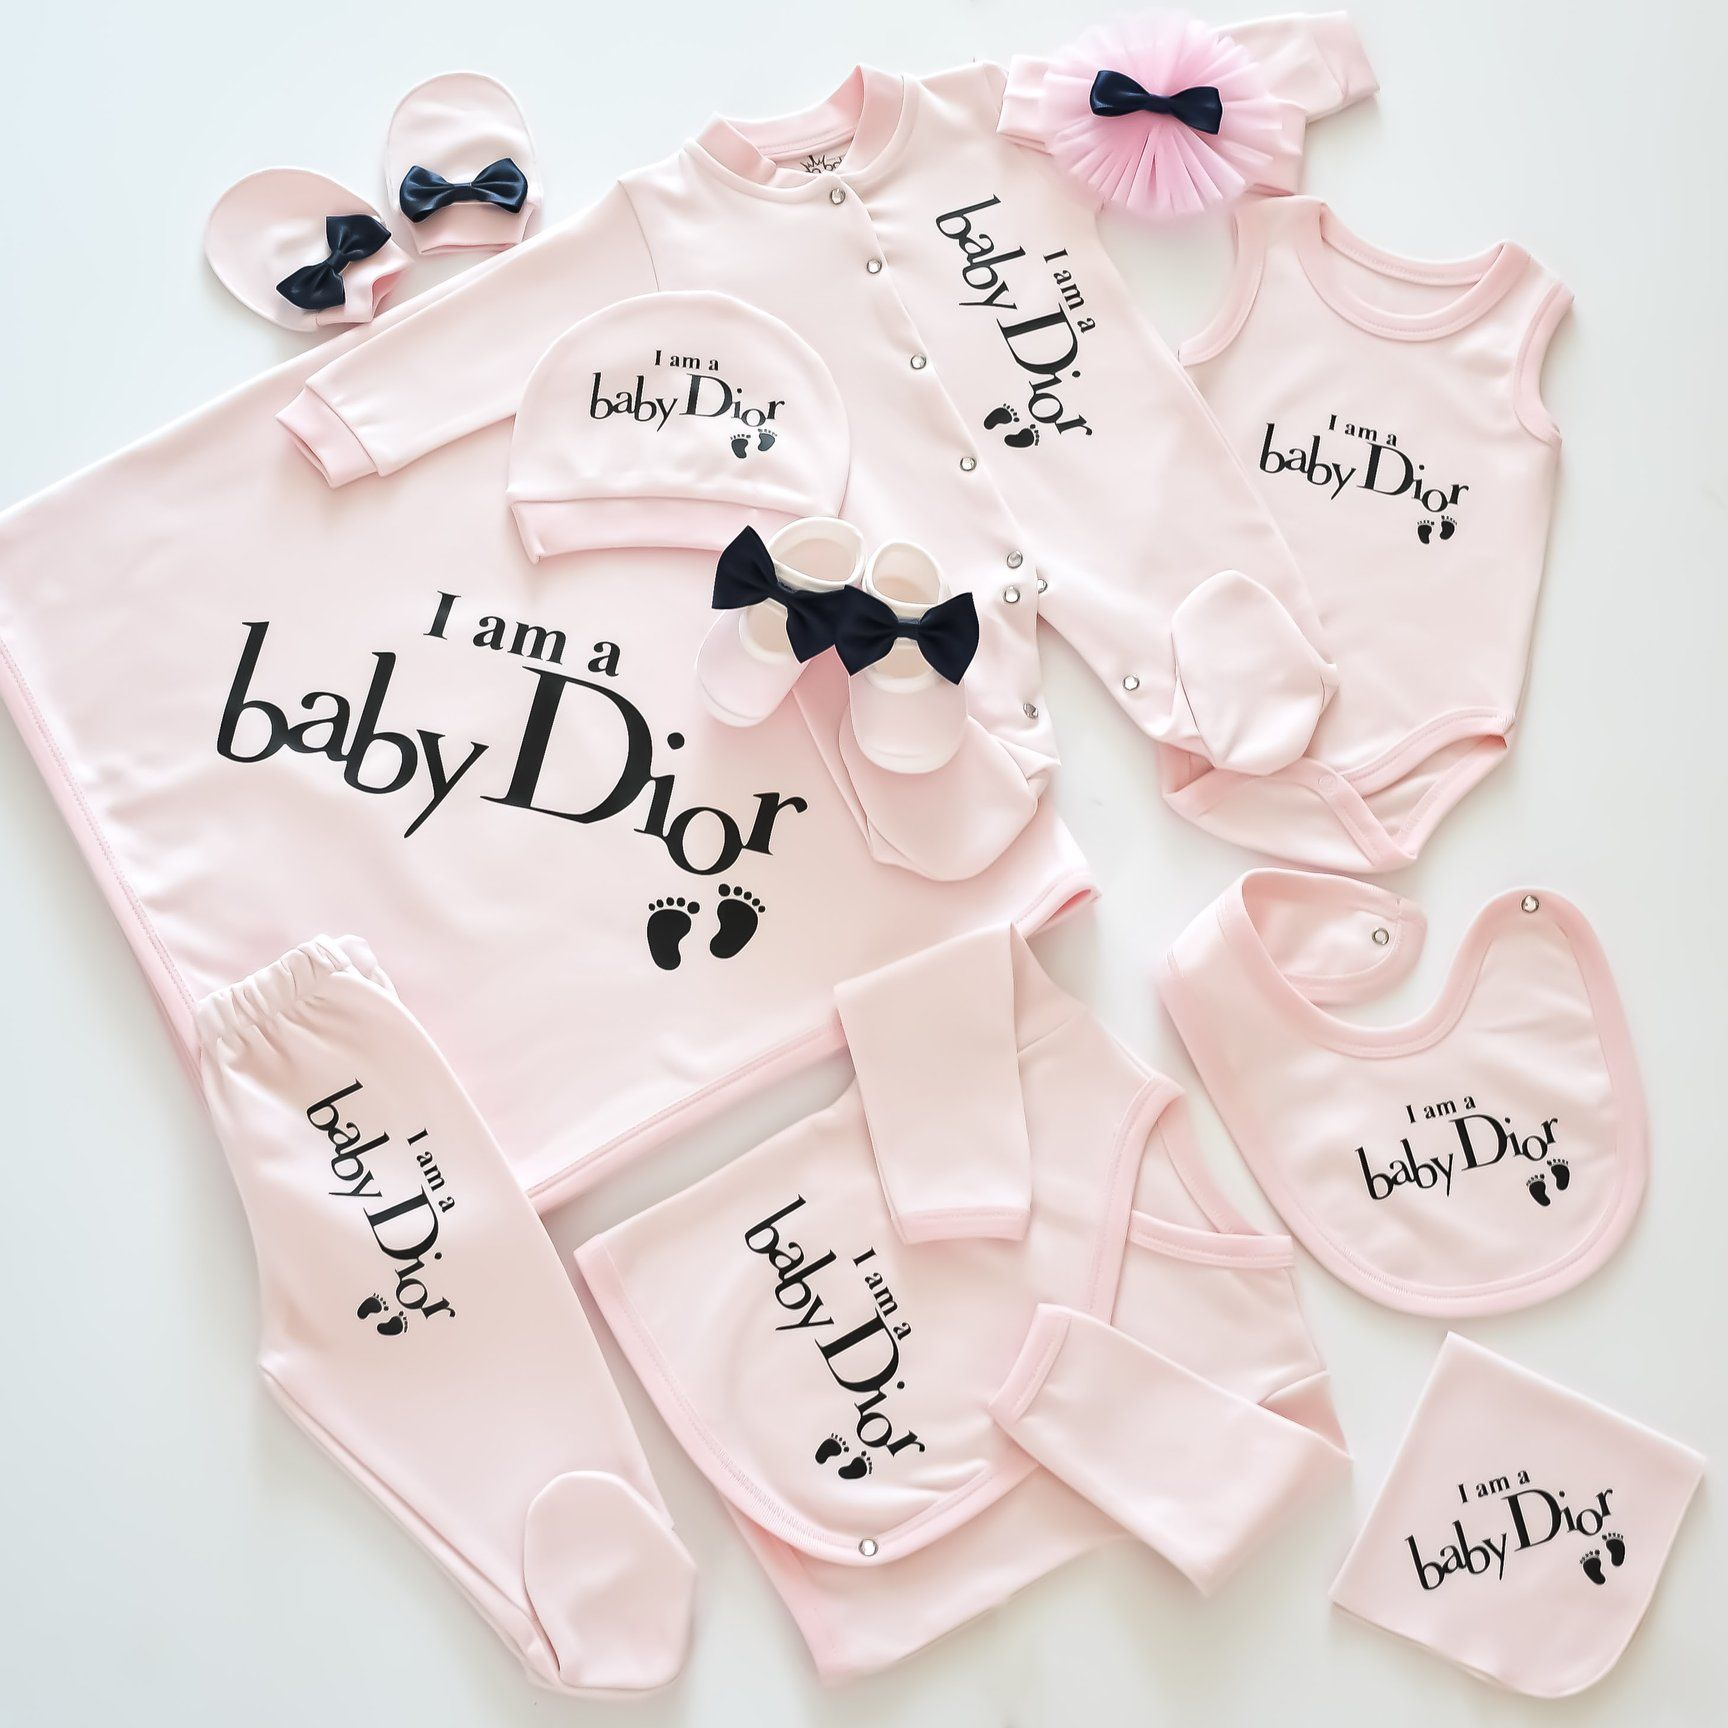 Baby CHANEL Inspired Newborn Baby Set  Baby dior, Baby chanel